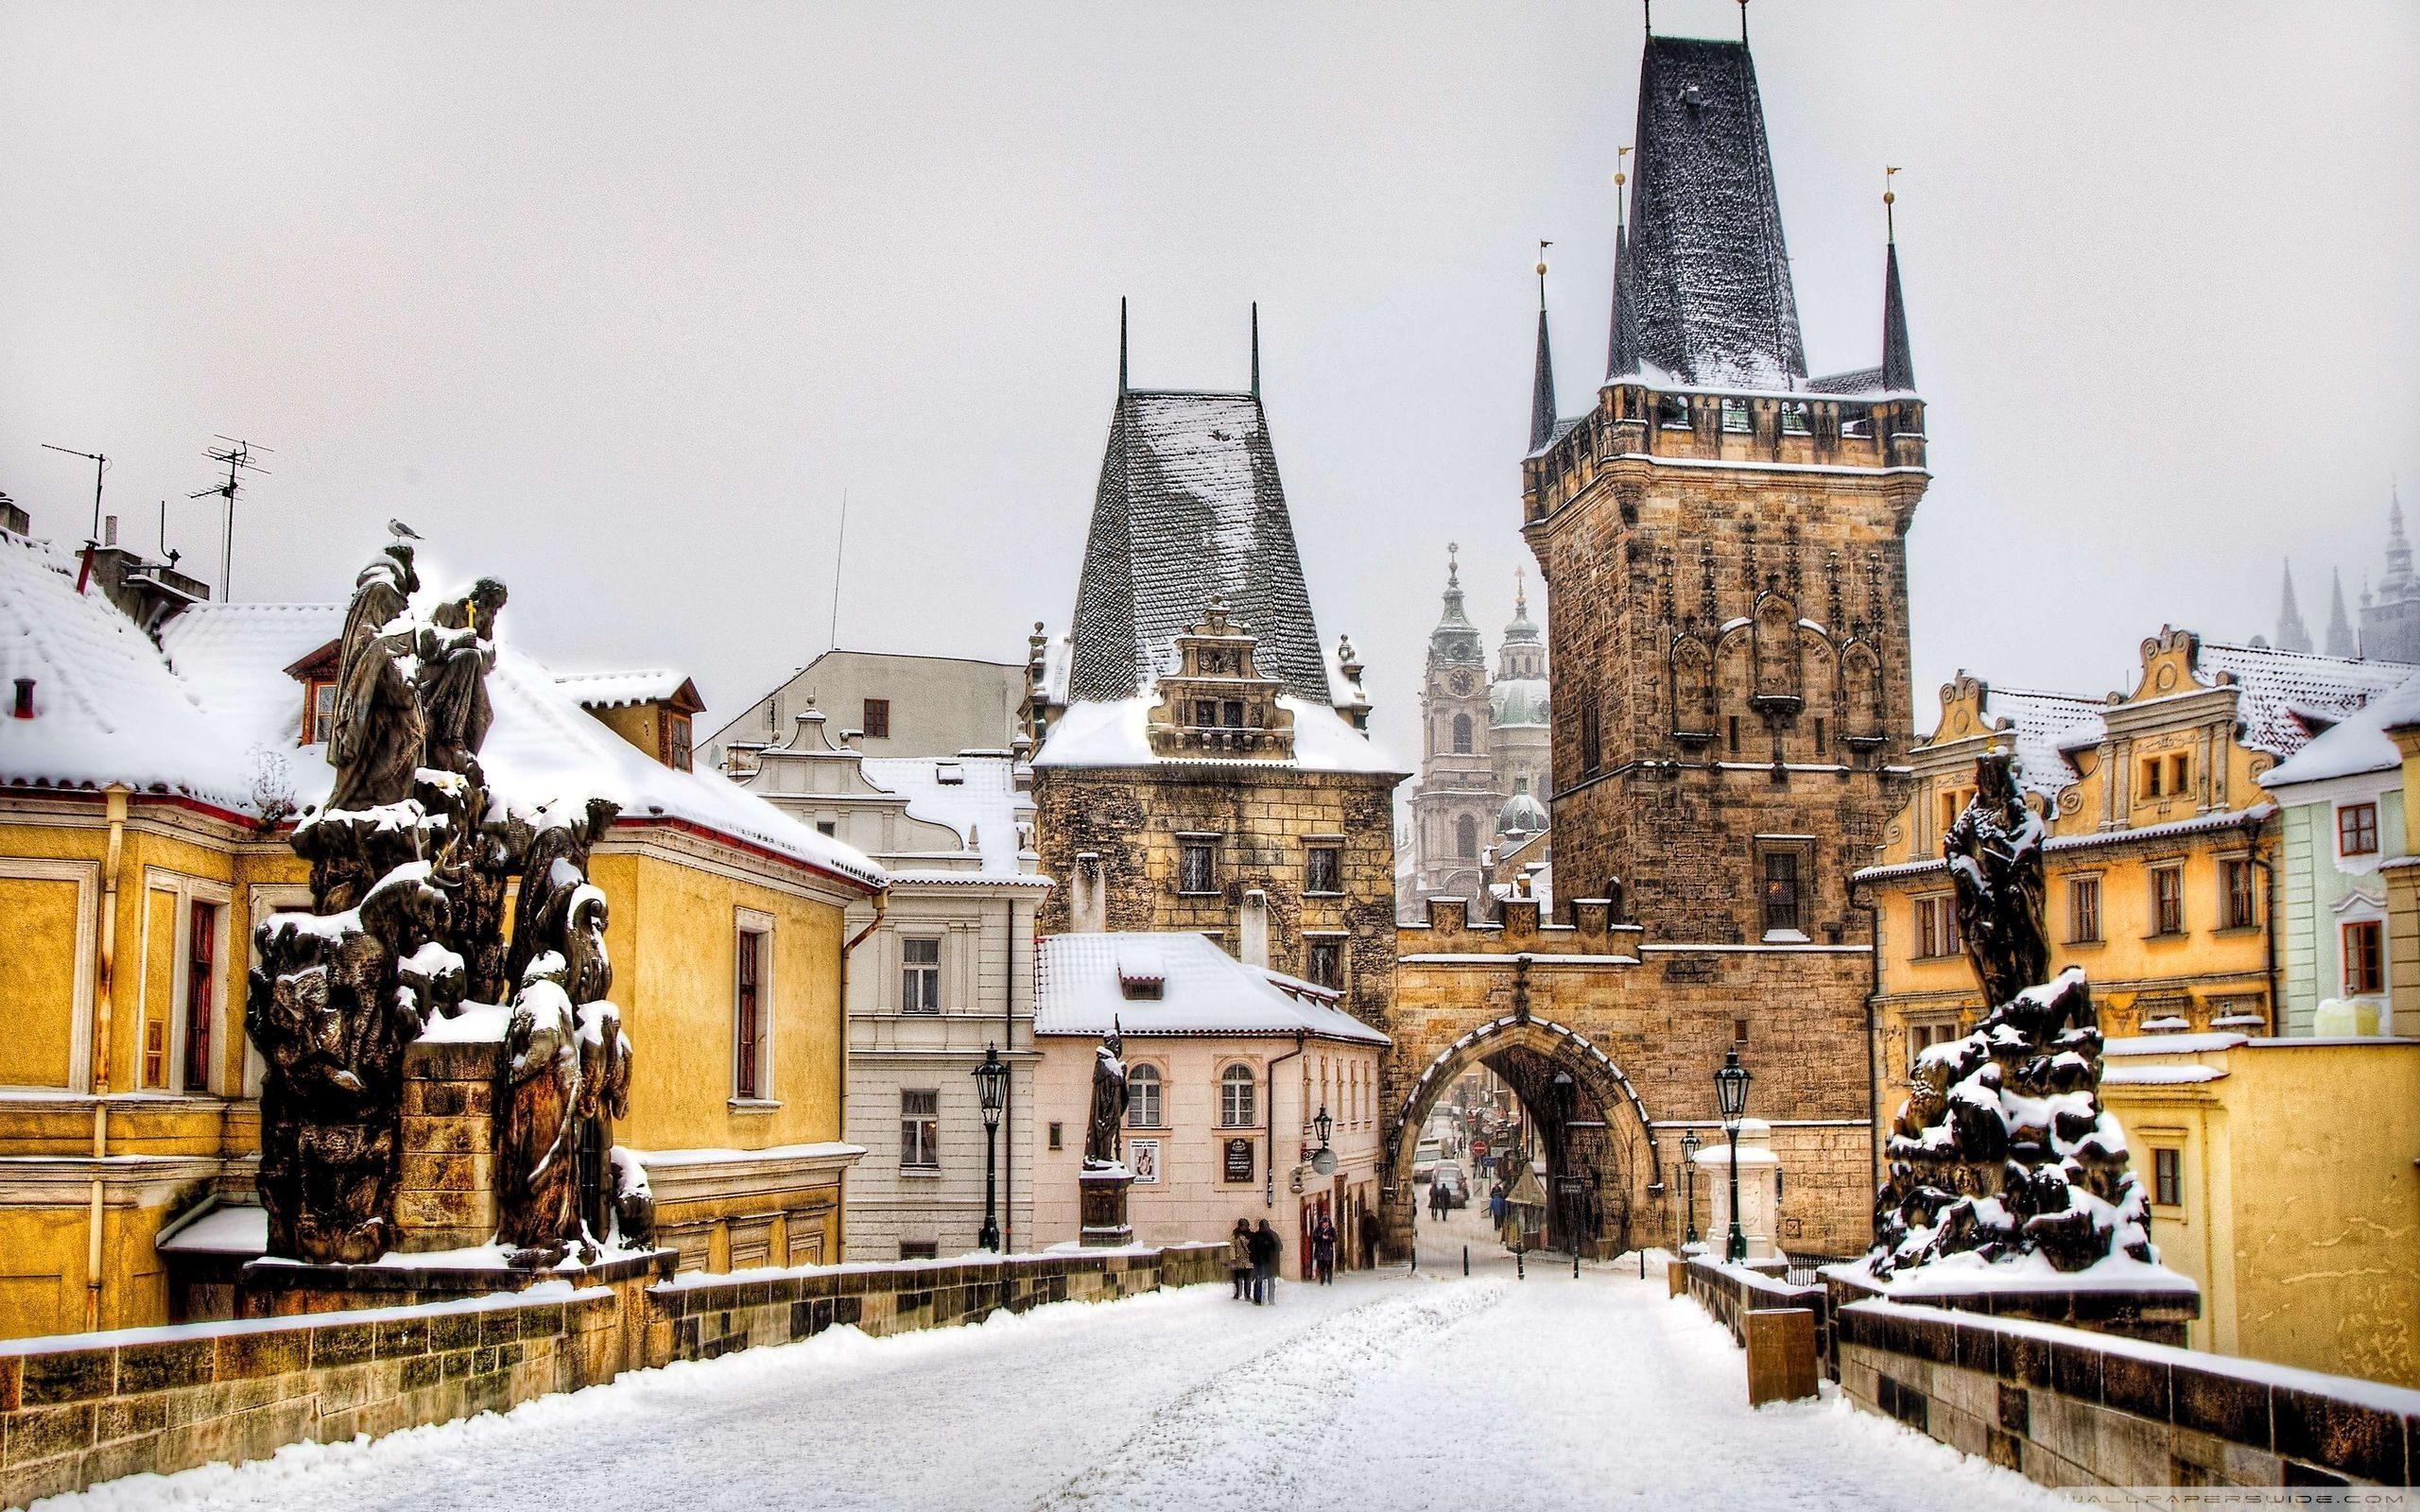 Prague in Winter Wallpapers - Top Free Prague in Winter Backgrounds - WallpaperAccess